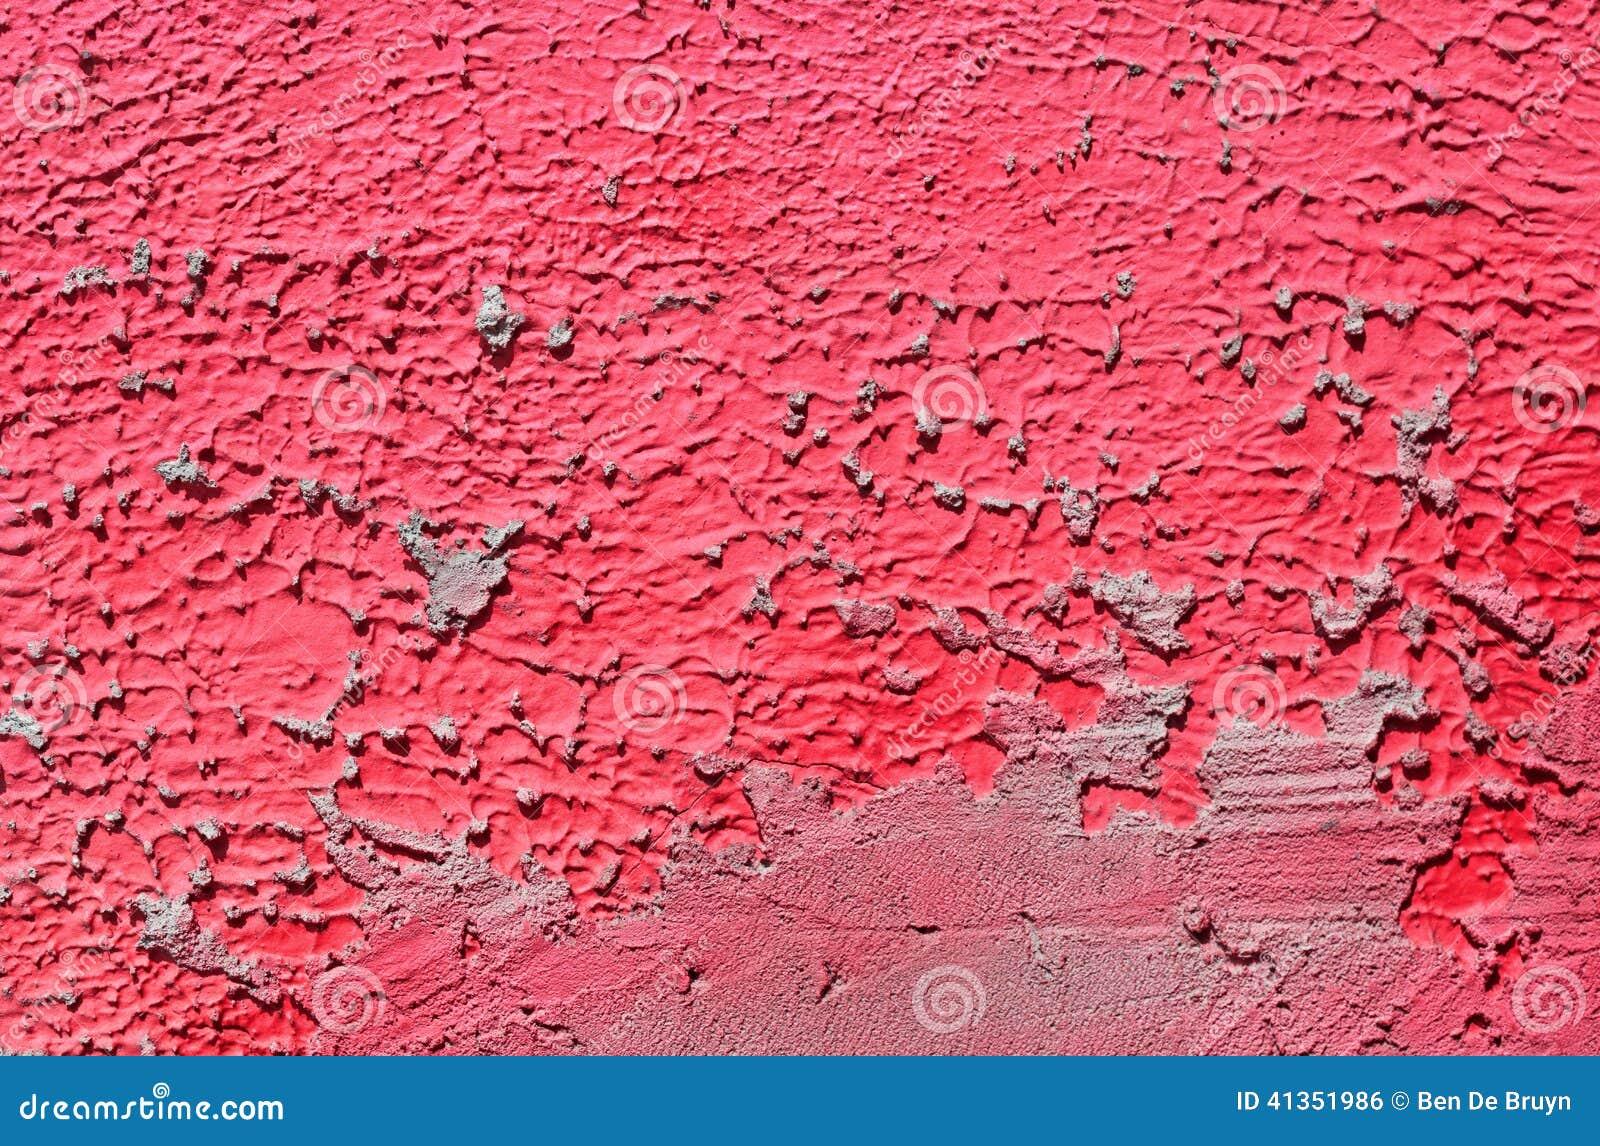 Wand mit bunter purpurroter rosa wandfarben musterfarbe for Wandfarben muster